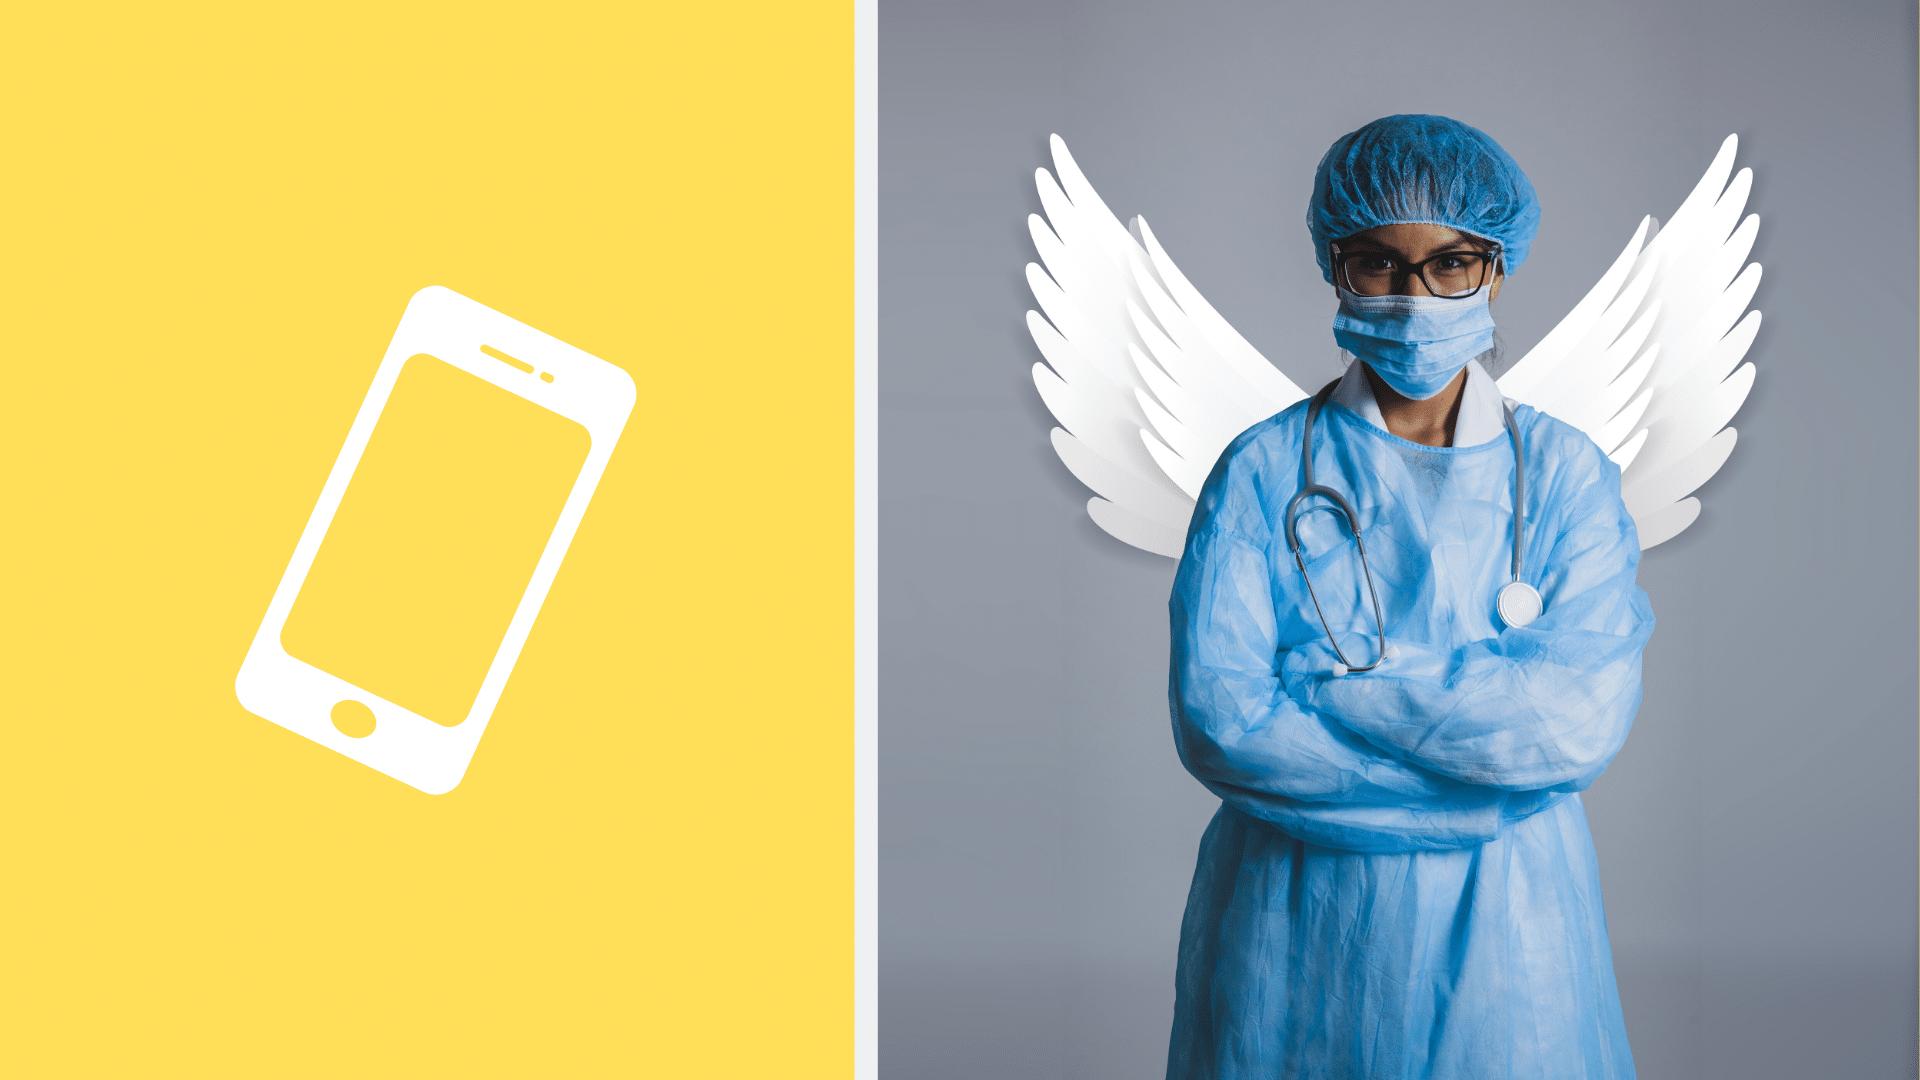 phone-on-demand-medical-symbol